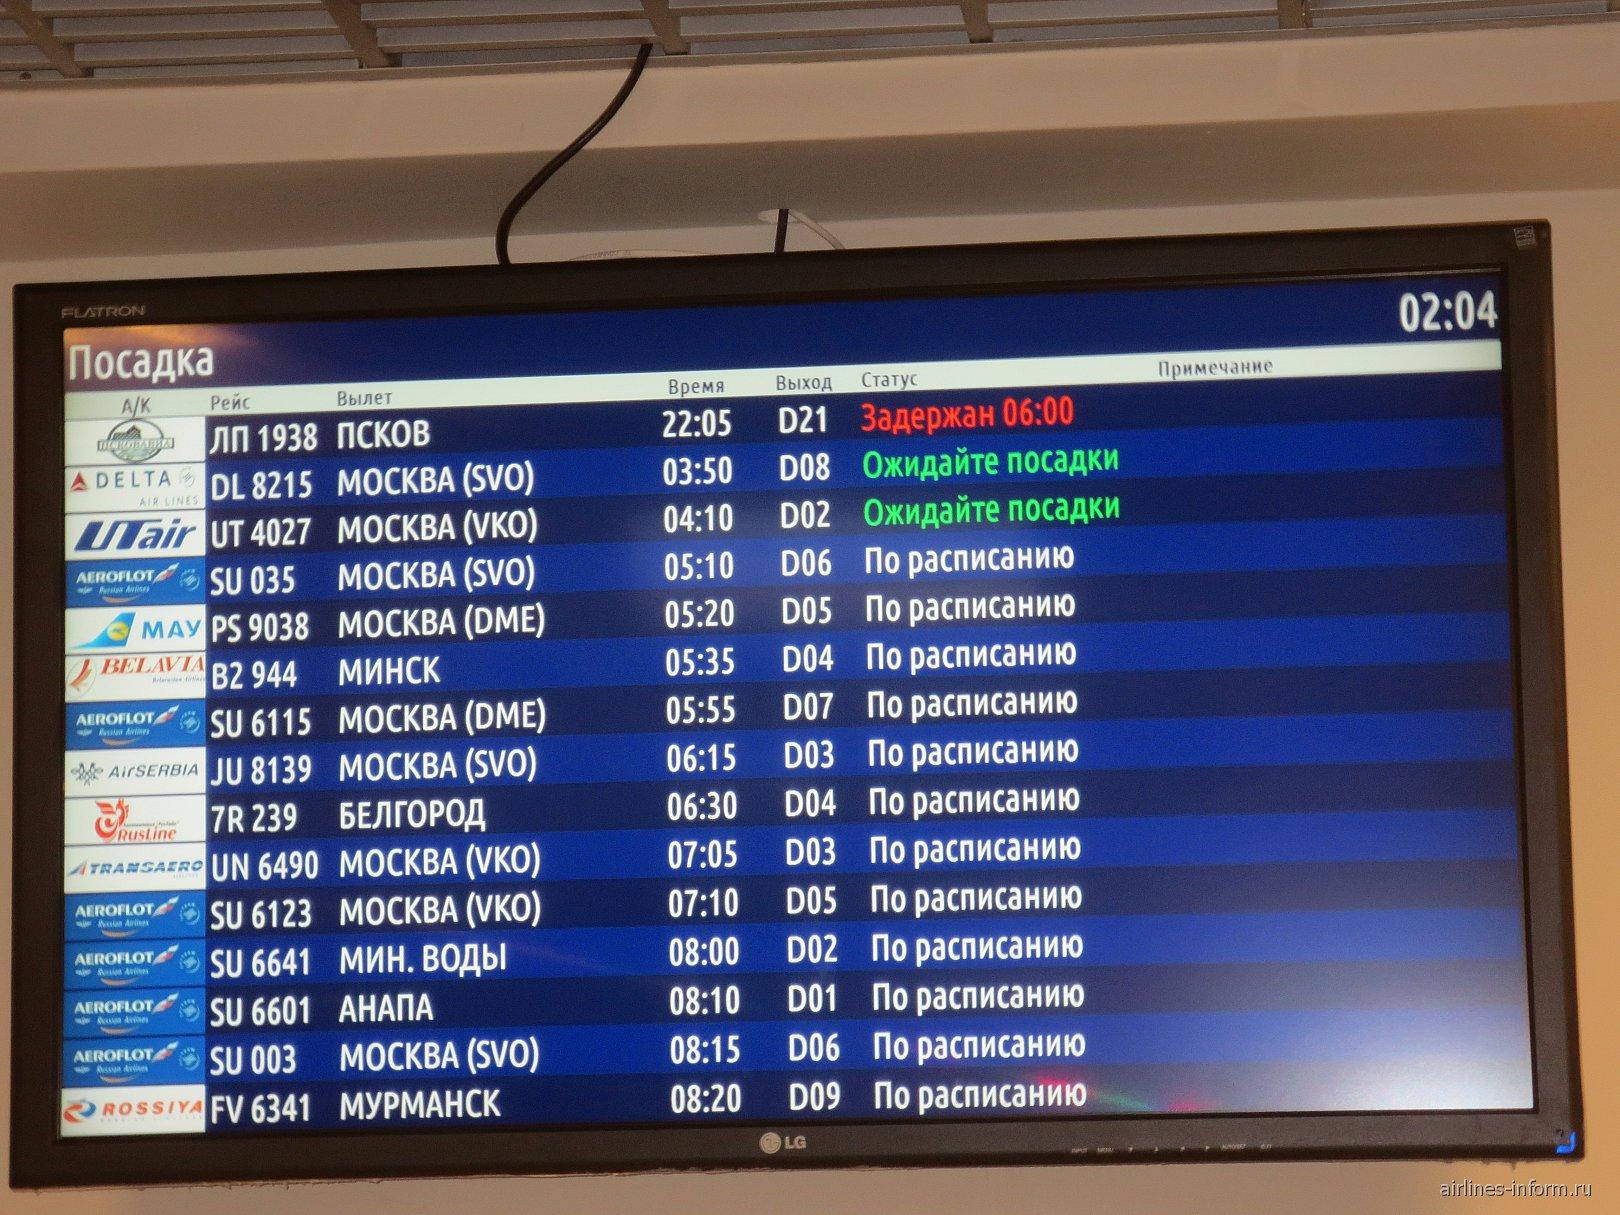 Санкт-Петербург-Москва-Дели и обратно Трансаэро